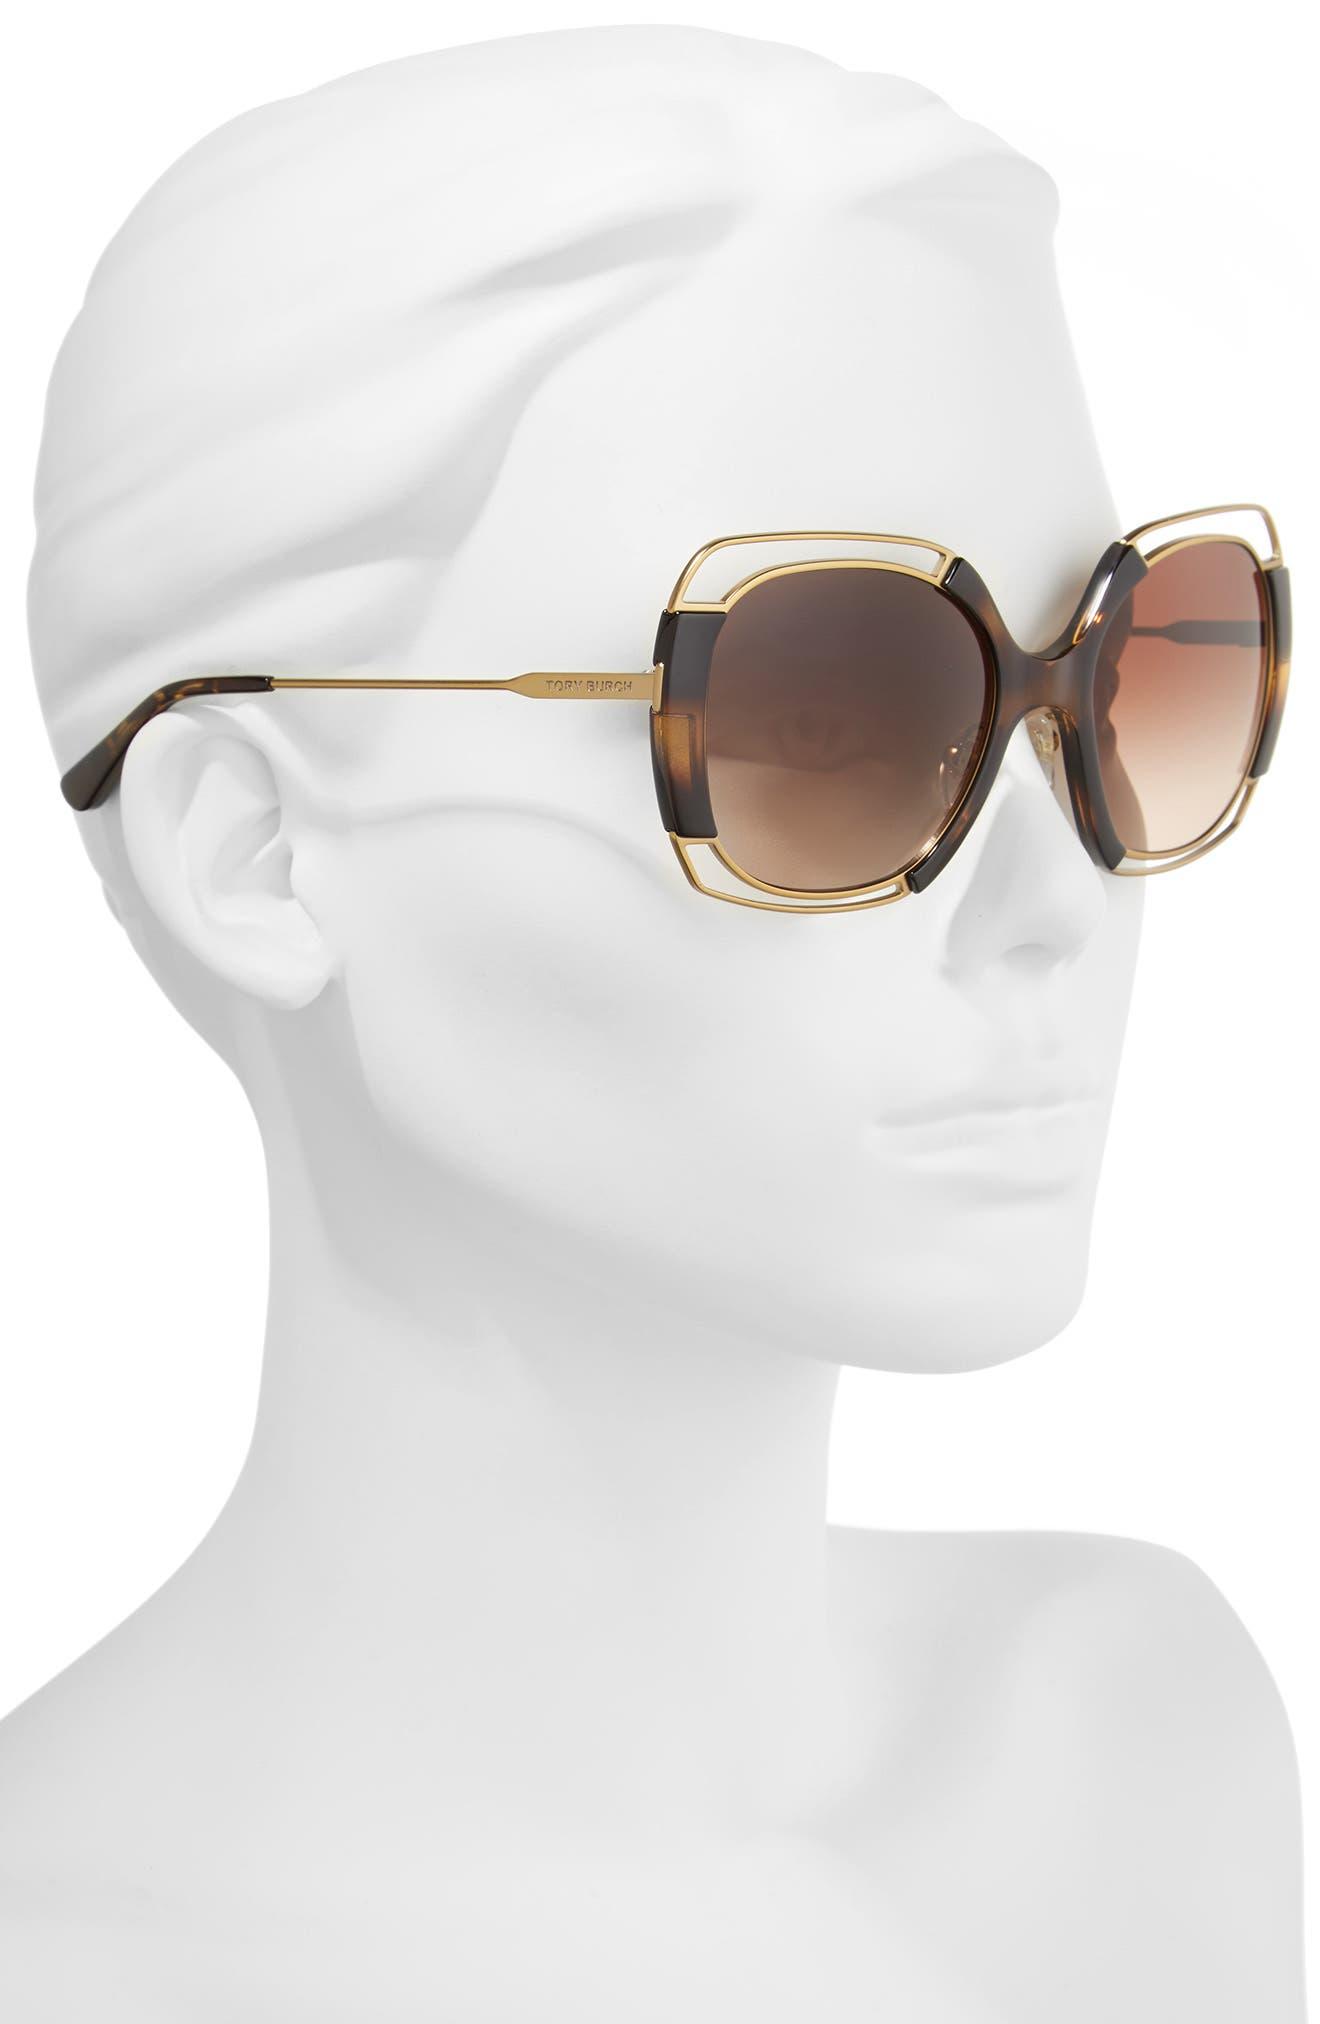 54mm Square Gradient Sunglasses,                             Alternate thumbnail 6, color,